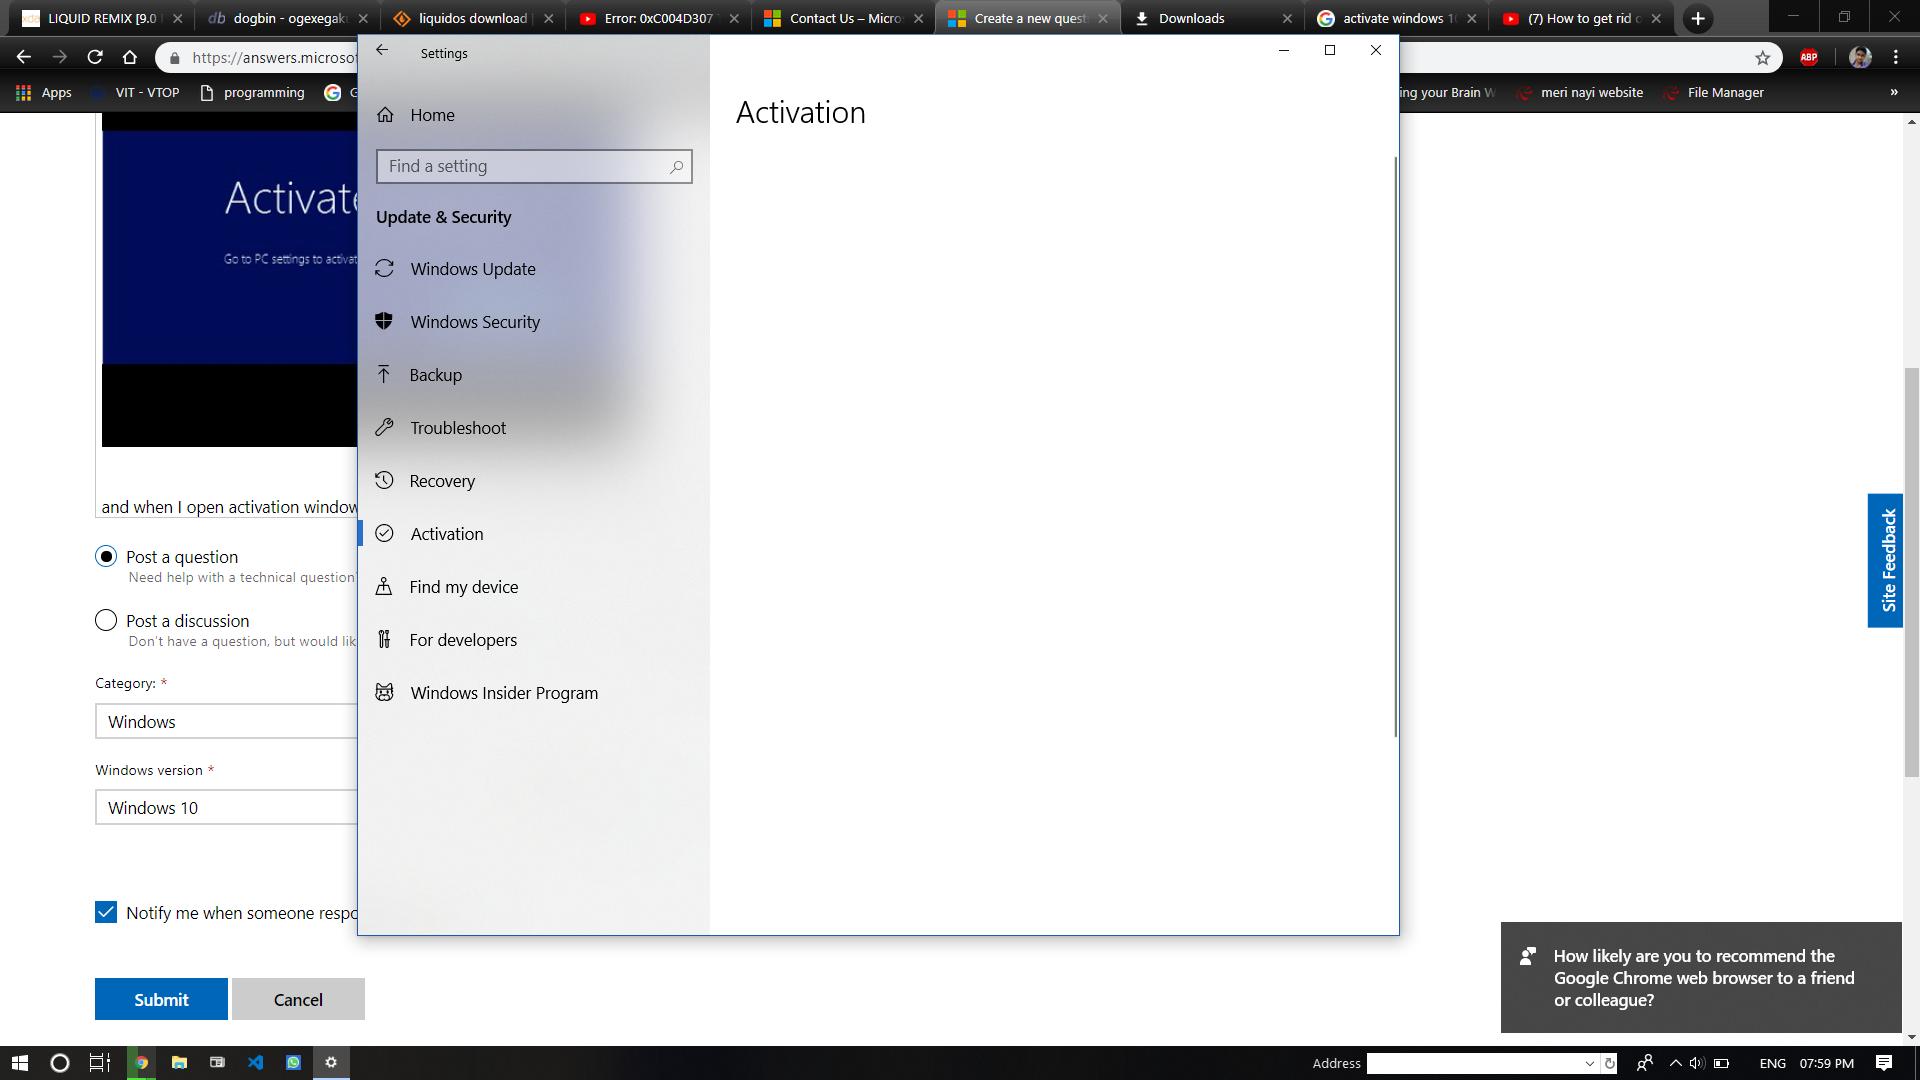 Activate Windows prompt error and Activation window white blank error. 48c9adb3-1cfc-4aa4-85f5-f0c30df9001e?upload=true.png